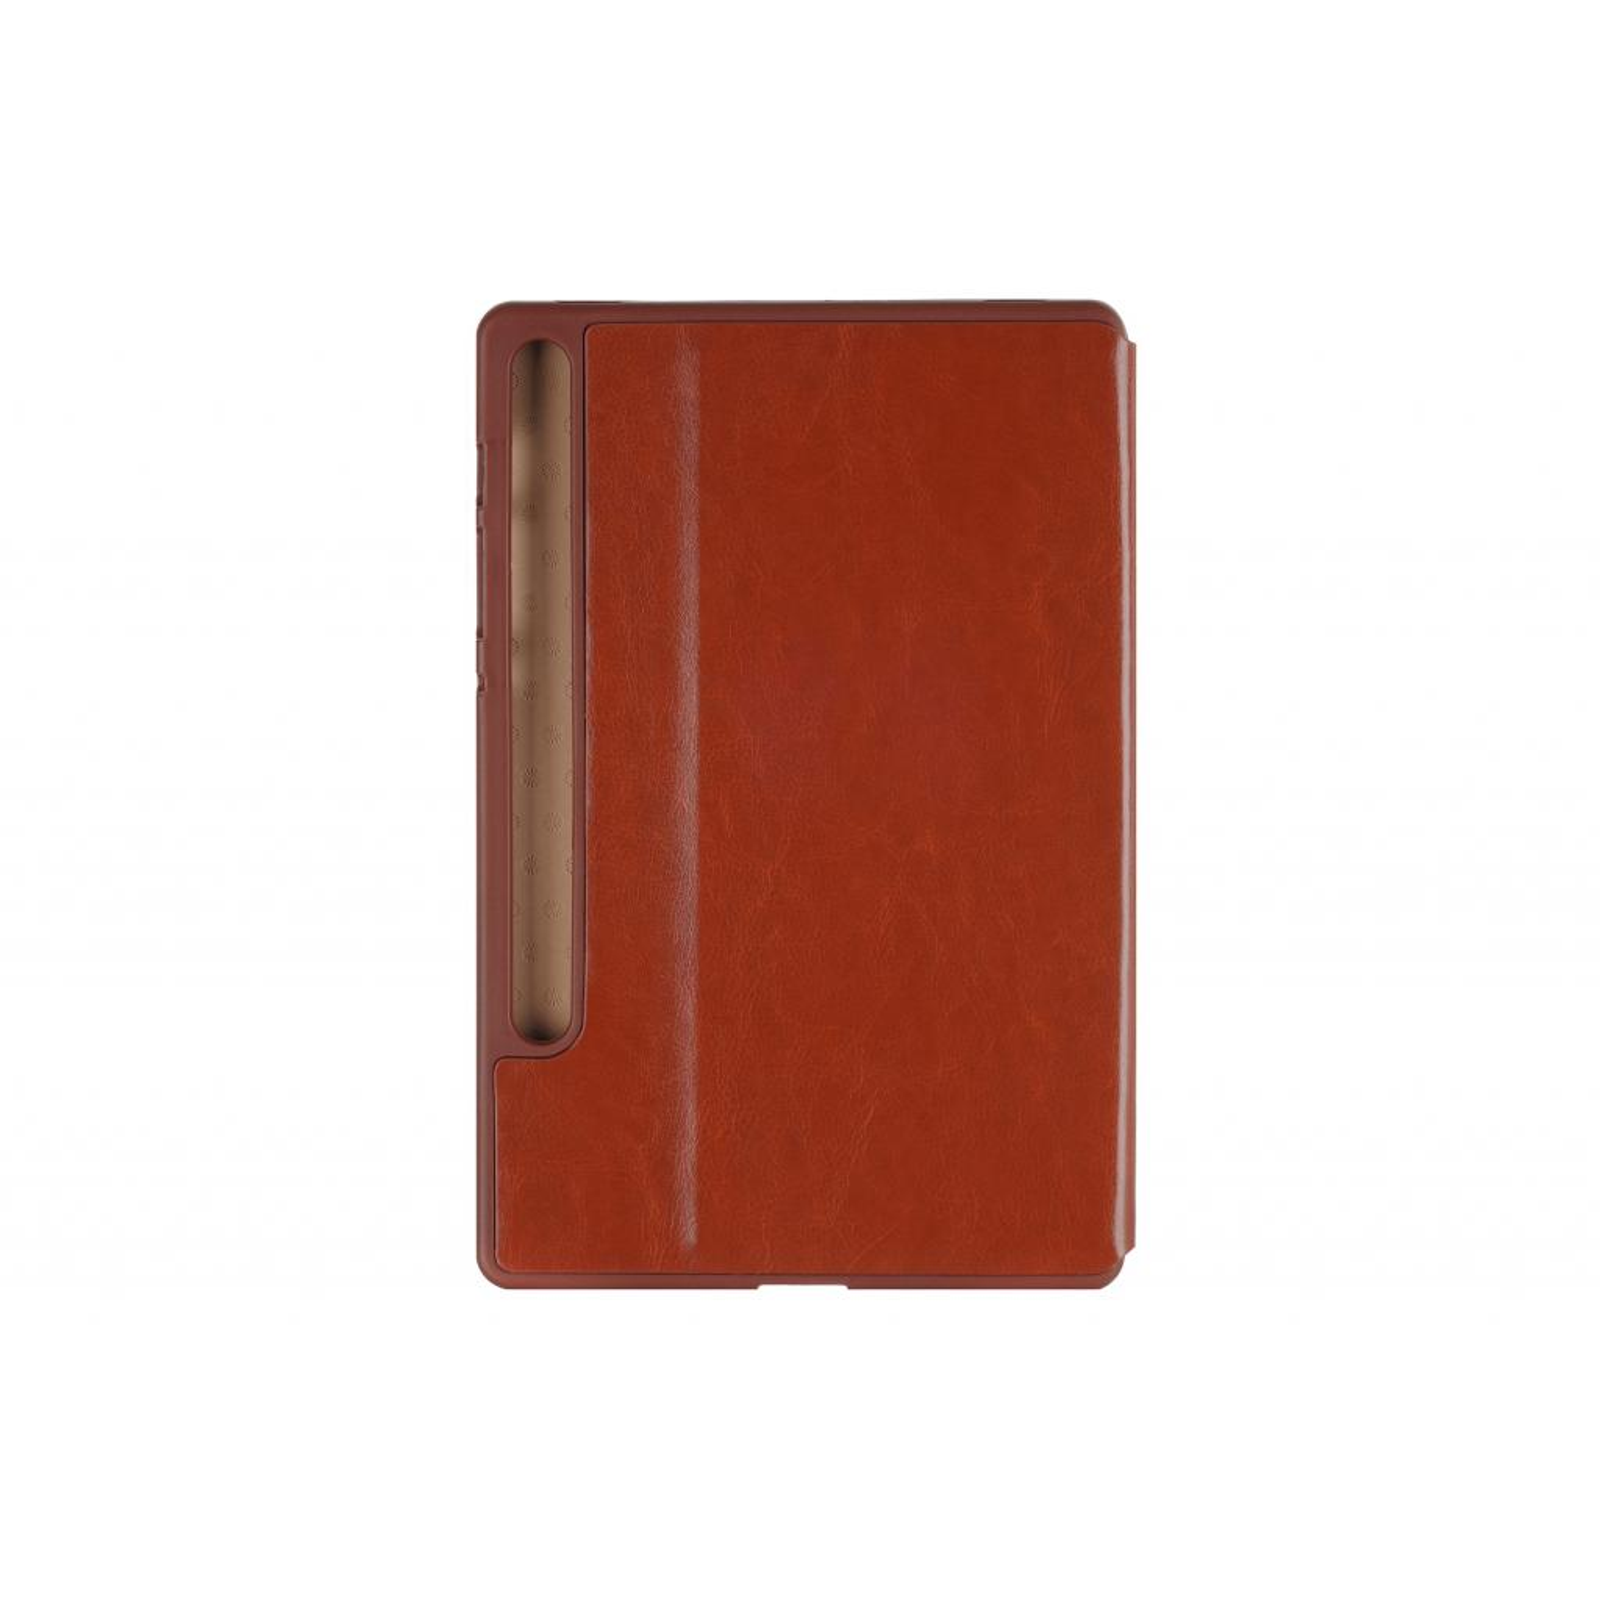 Чохол до планшета 2E Samsung Galaxy Tab S6, Retro, Brown (2E-G-S6-IKRT-BR) зображення 2